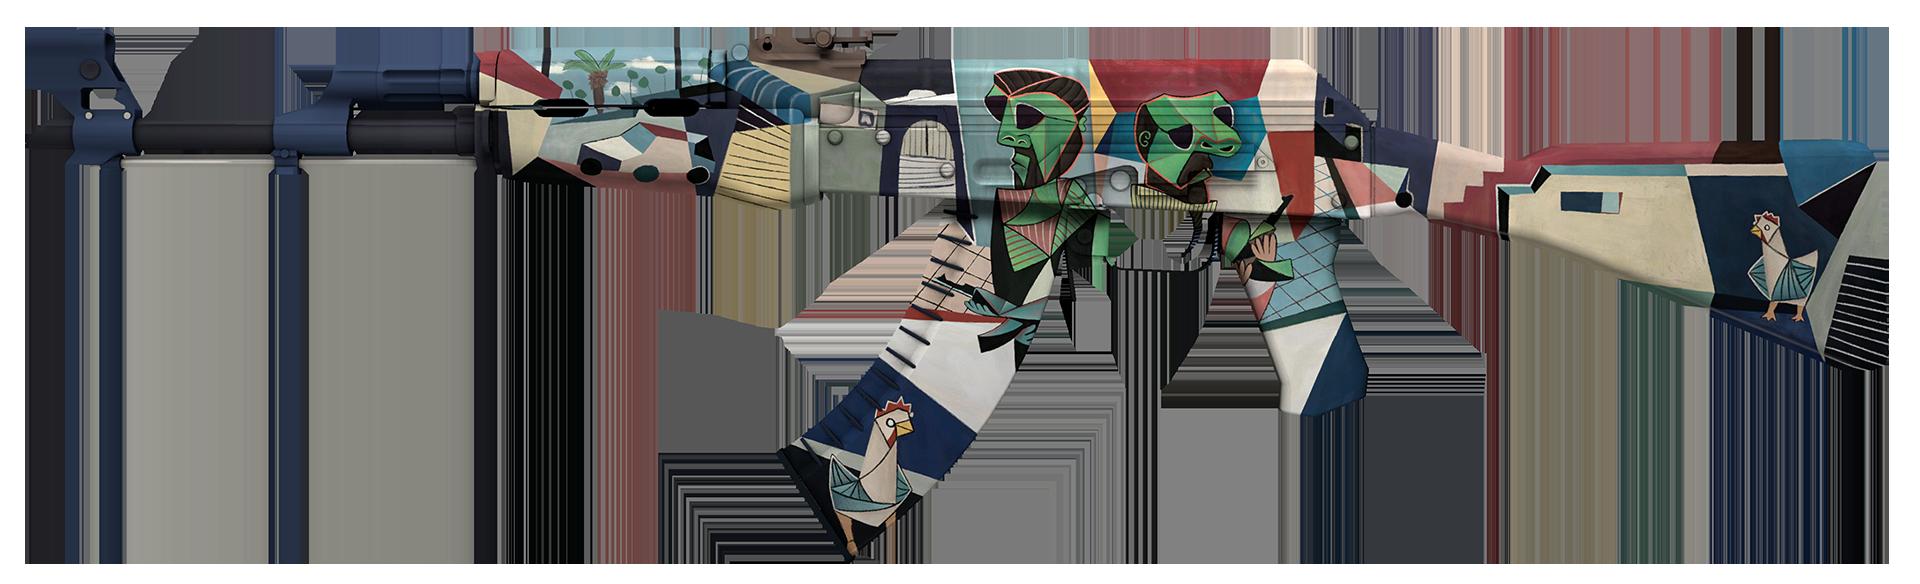 AK-47 Leet Museo Large Rendering